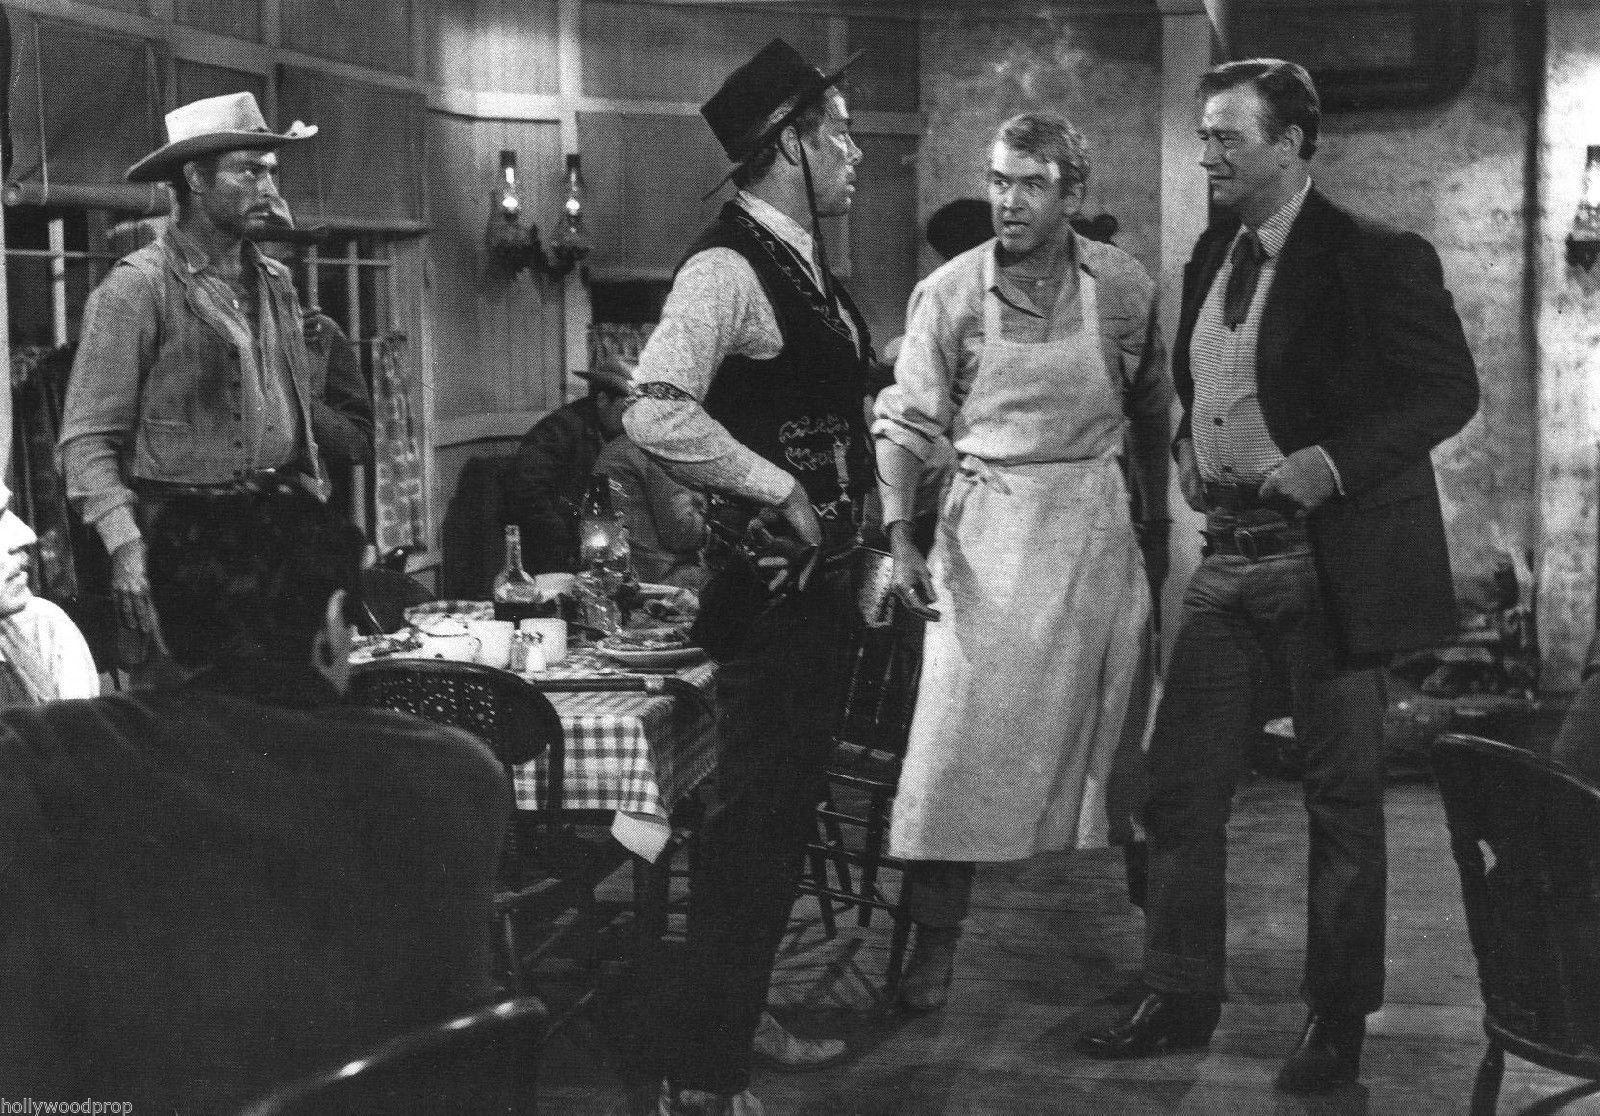 The Man Who Shot Liberty Valance 1962 Lee Van Cleef Lee Marvin James Stewart And John Wayne John Wayne John Wayne Movies Western Movies